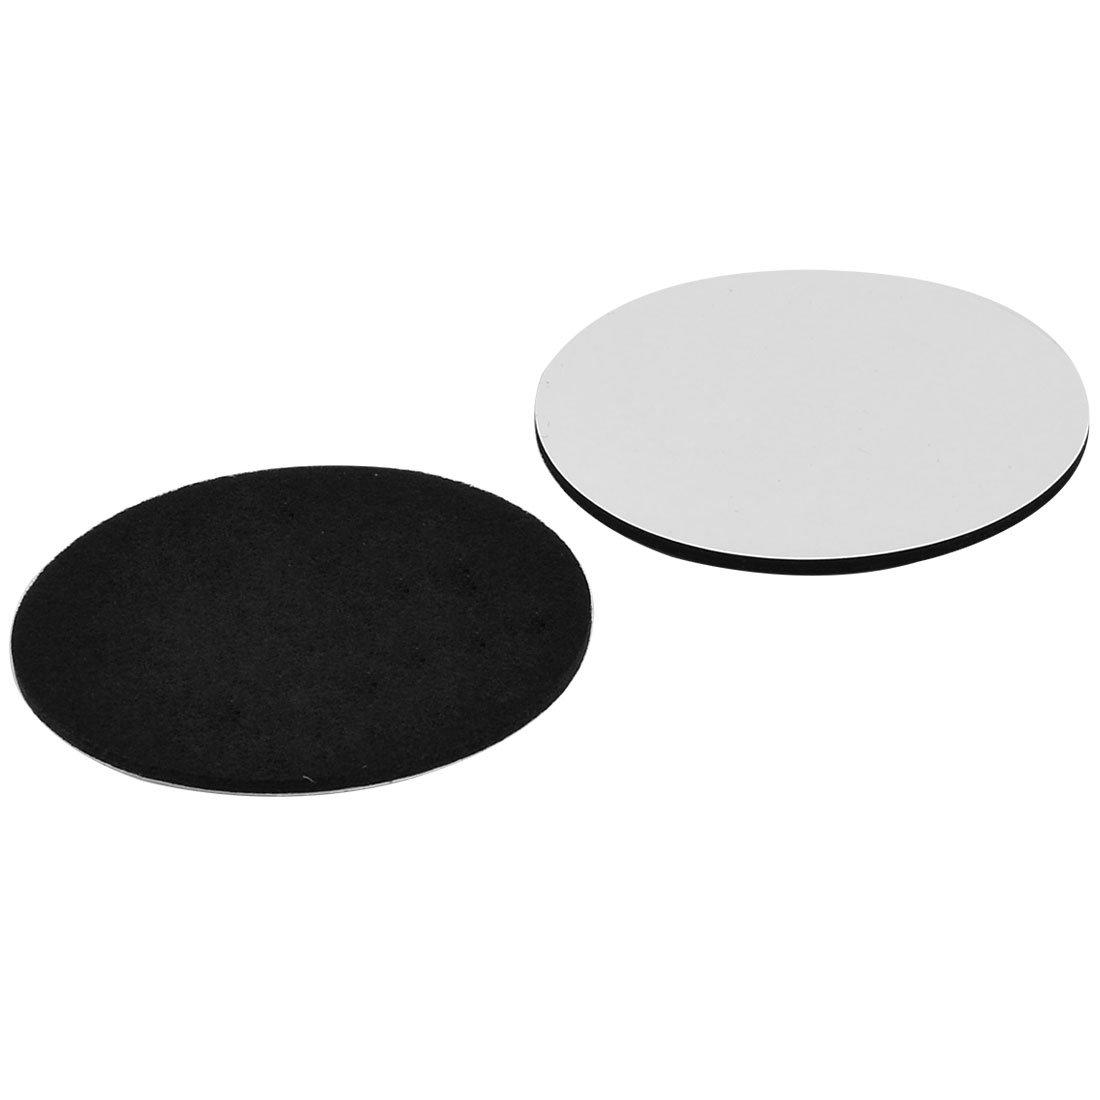 Sourcingmap/® Bodenm/öbel Filz Runde Anti-Rutsch Abdeckung Sch/ützerpolster Grau 85 mm /Ø 4 STK de